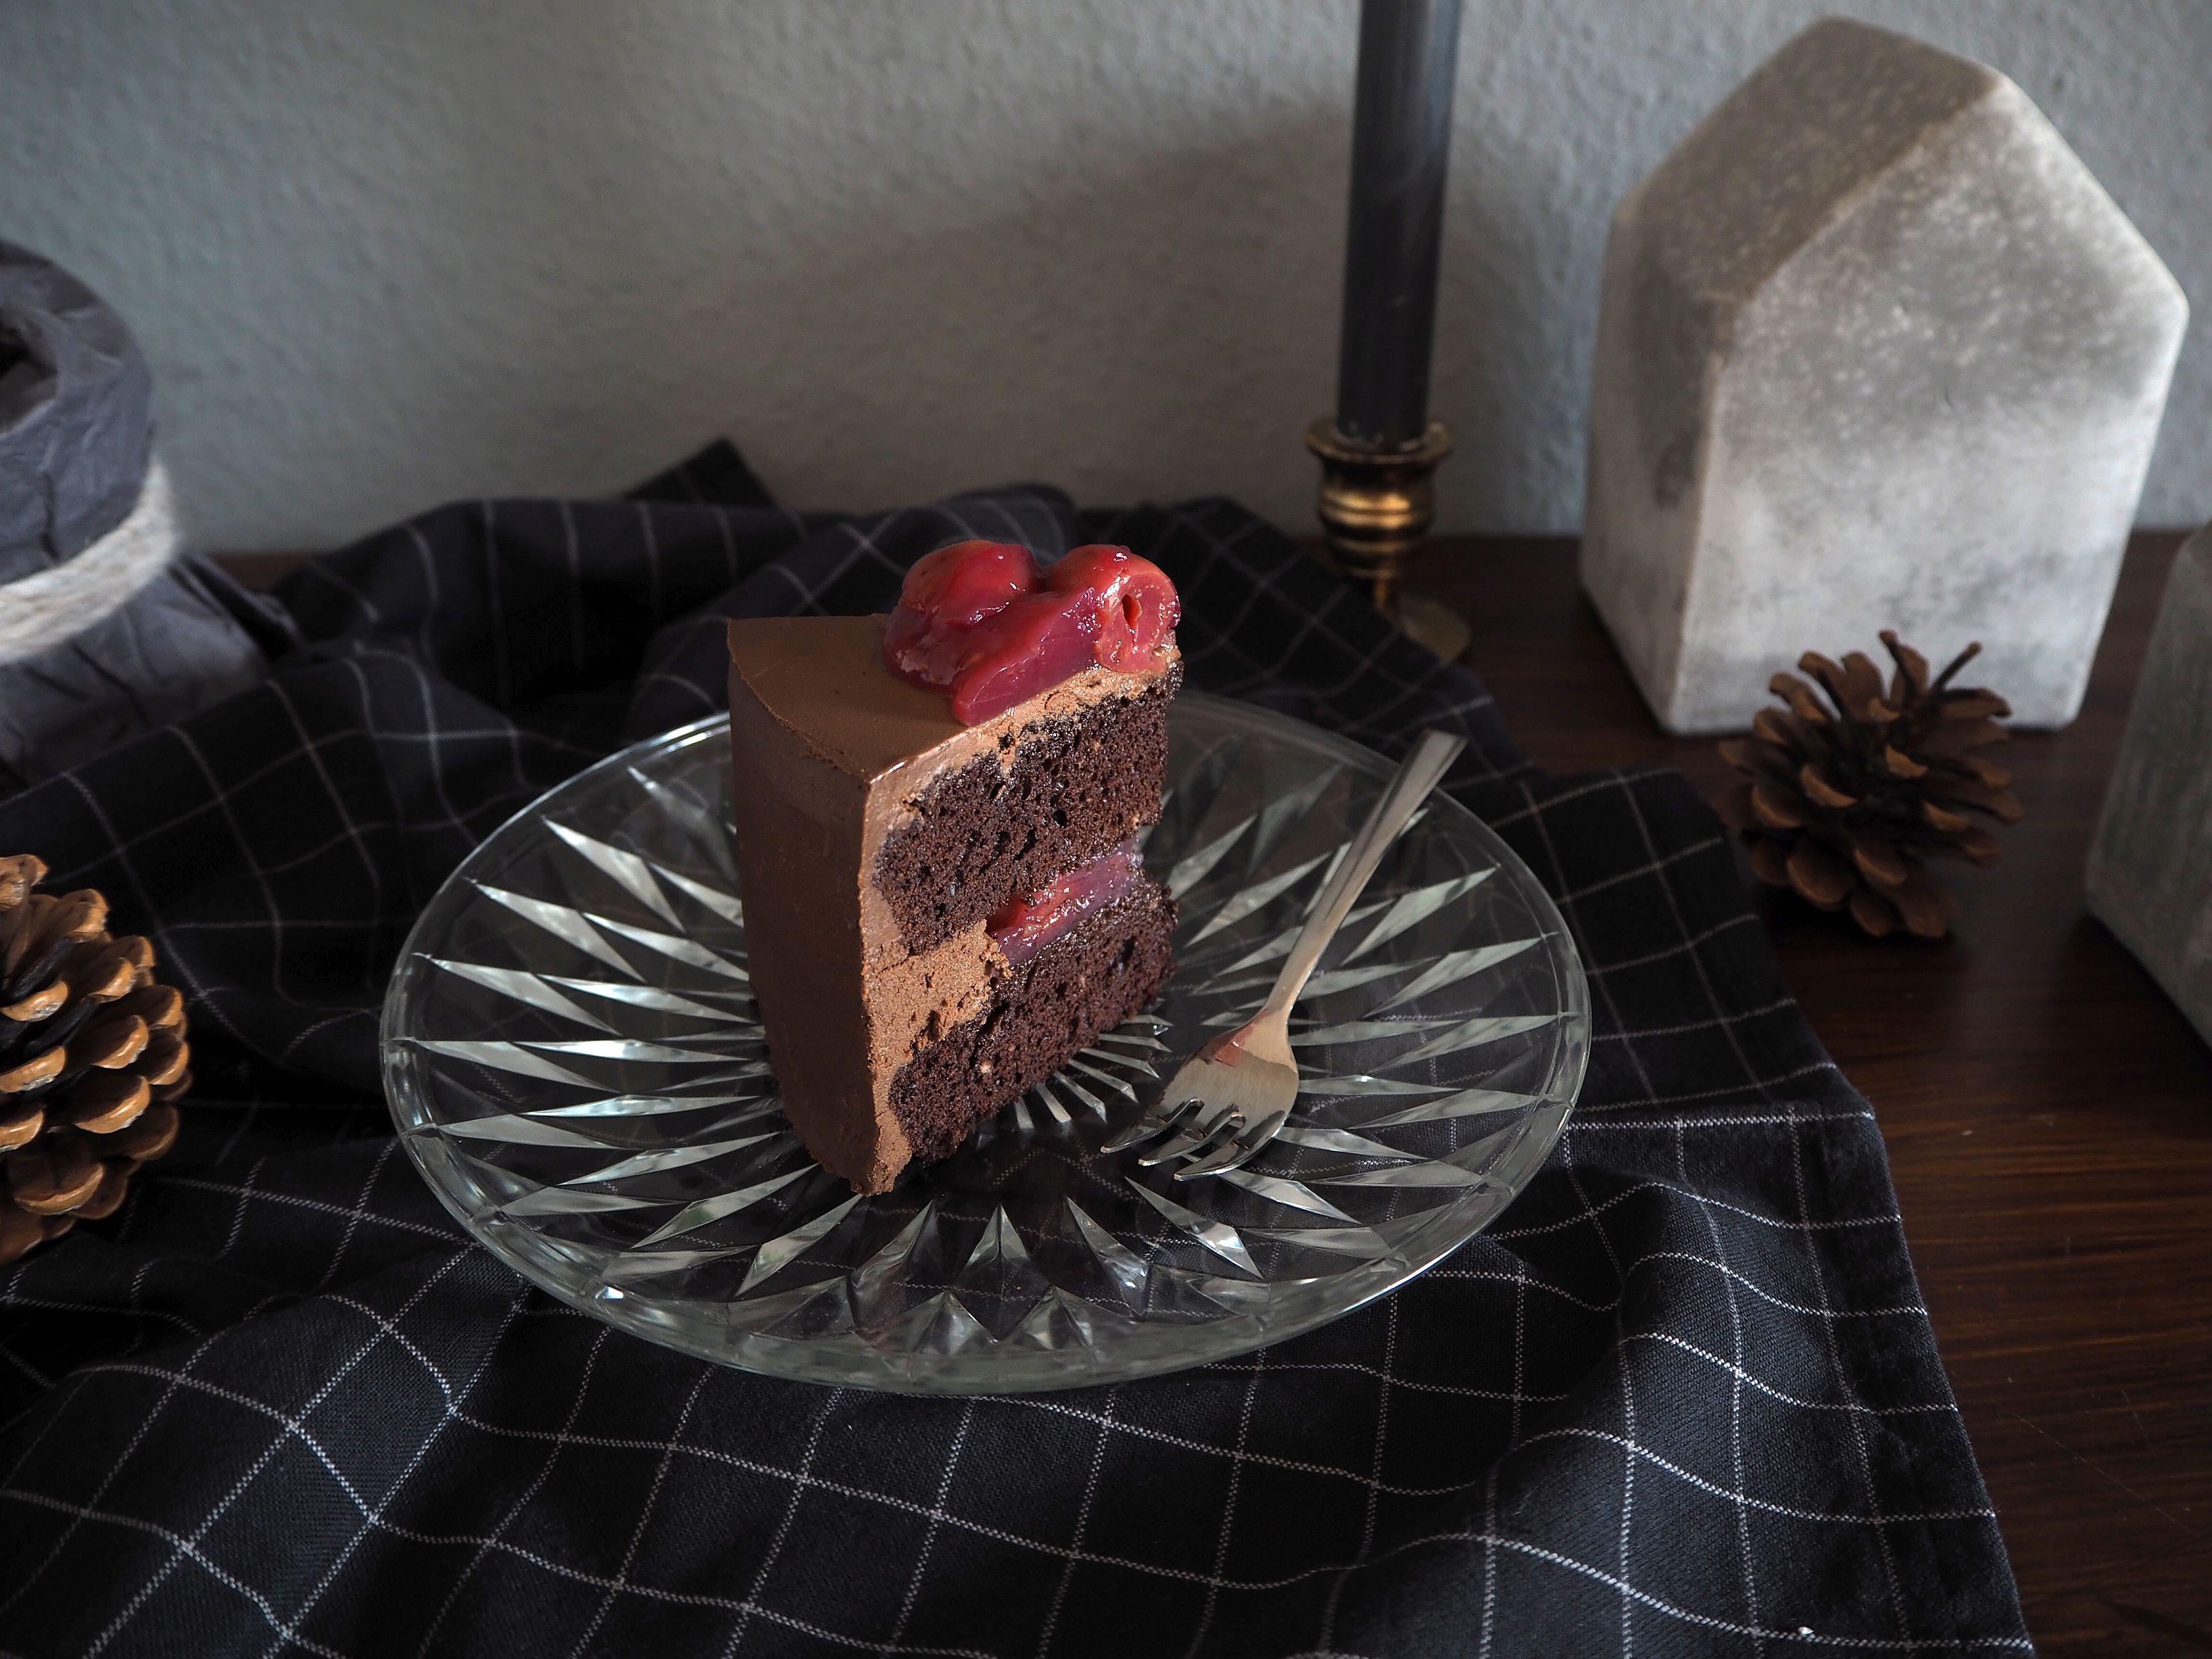 2017-12-skoen-och-kreativ-adventskalender-cookie-and-cake-love-chocolate-cherry-cake (11)